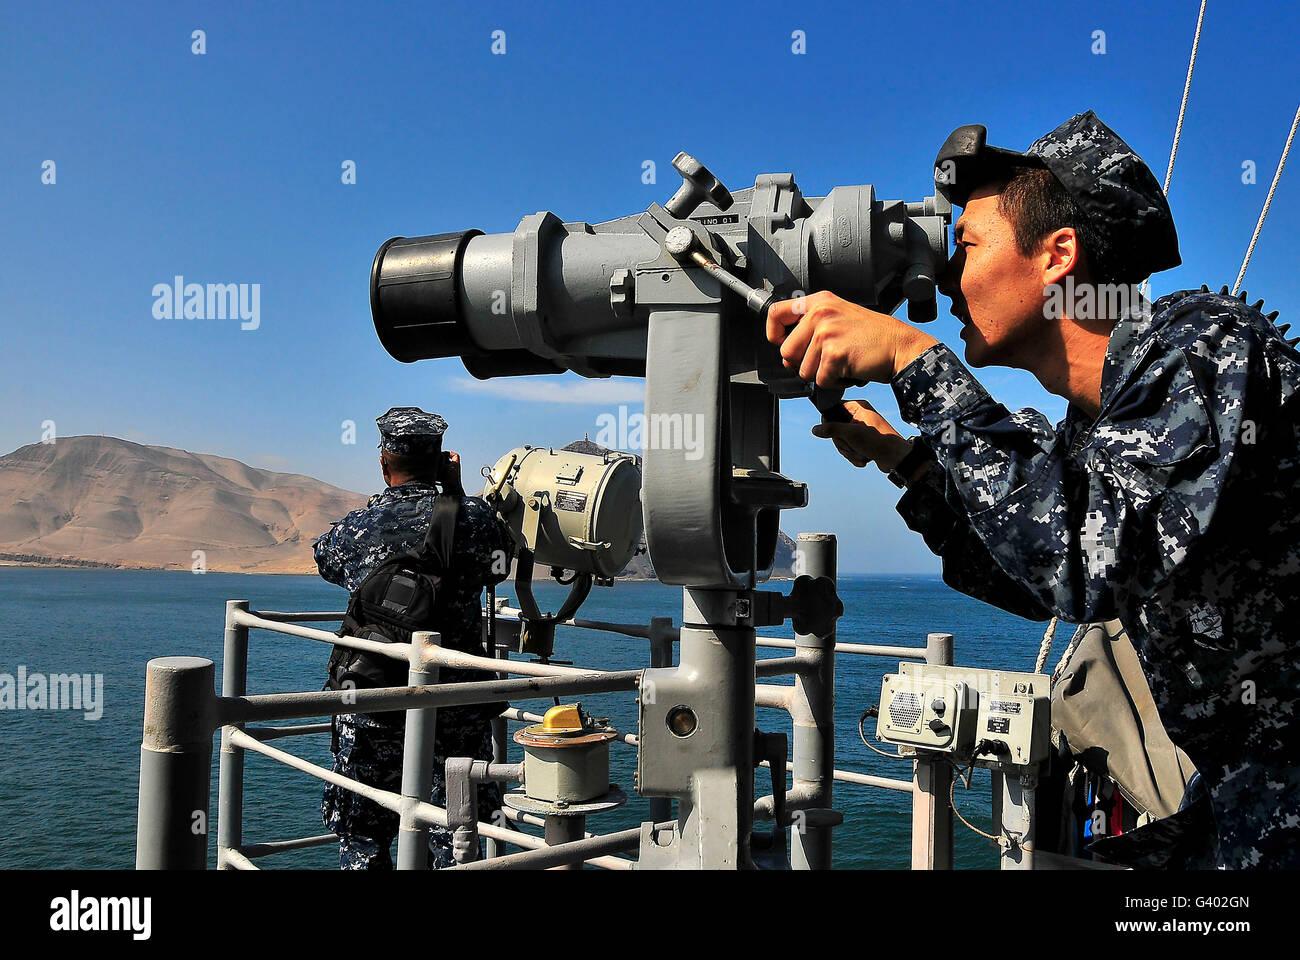 U.S. Navy sailors observe the coastline from aboard USS Bunker Hill. - Stock Image